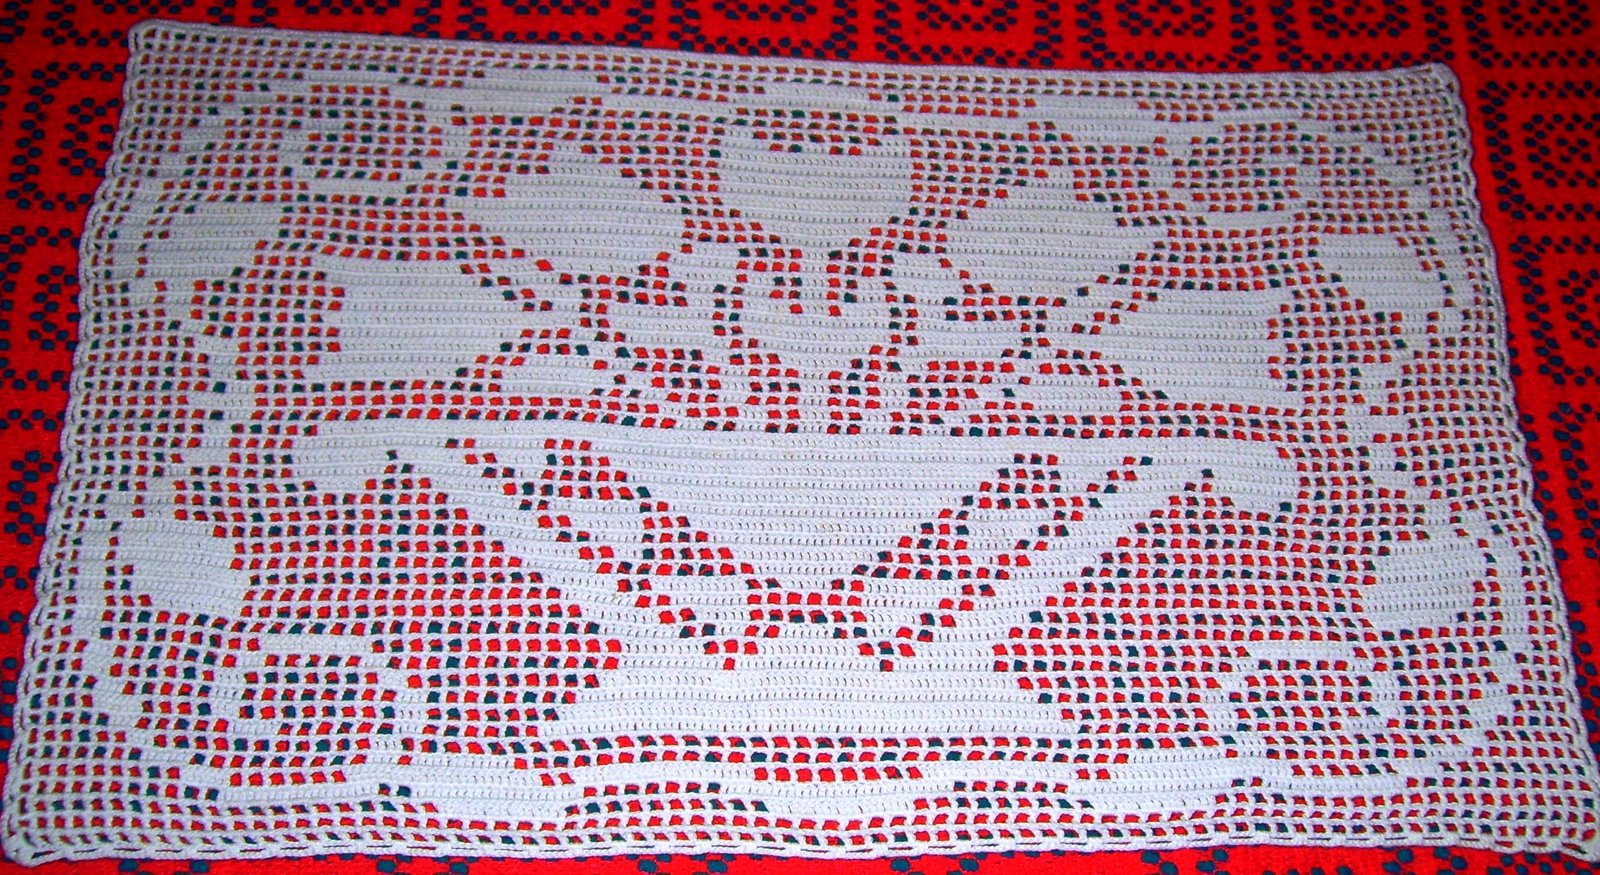 Tejer A Crochet Con Hilo Macrame